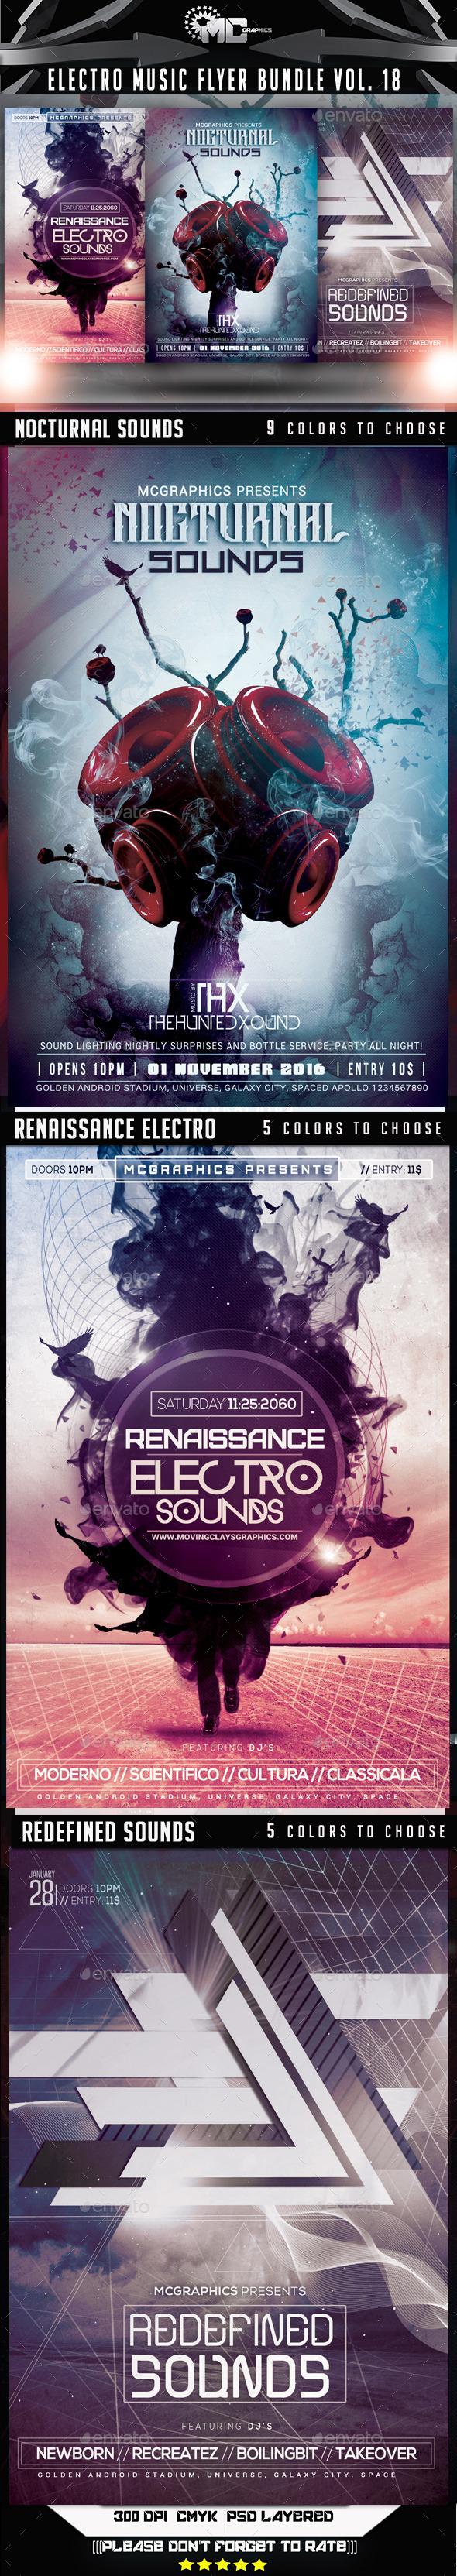 Electro Music Flyer Bundle Vol.18 - Clubs & Parties Events